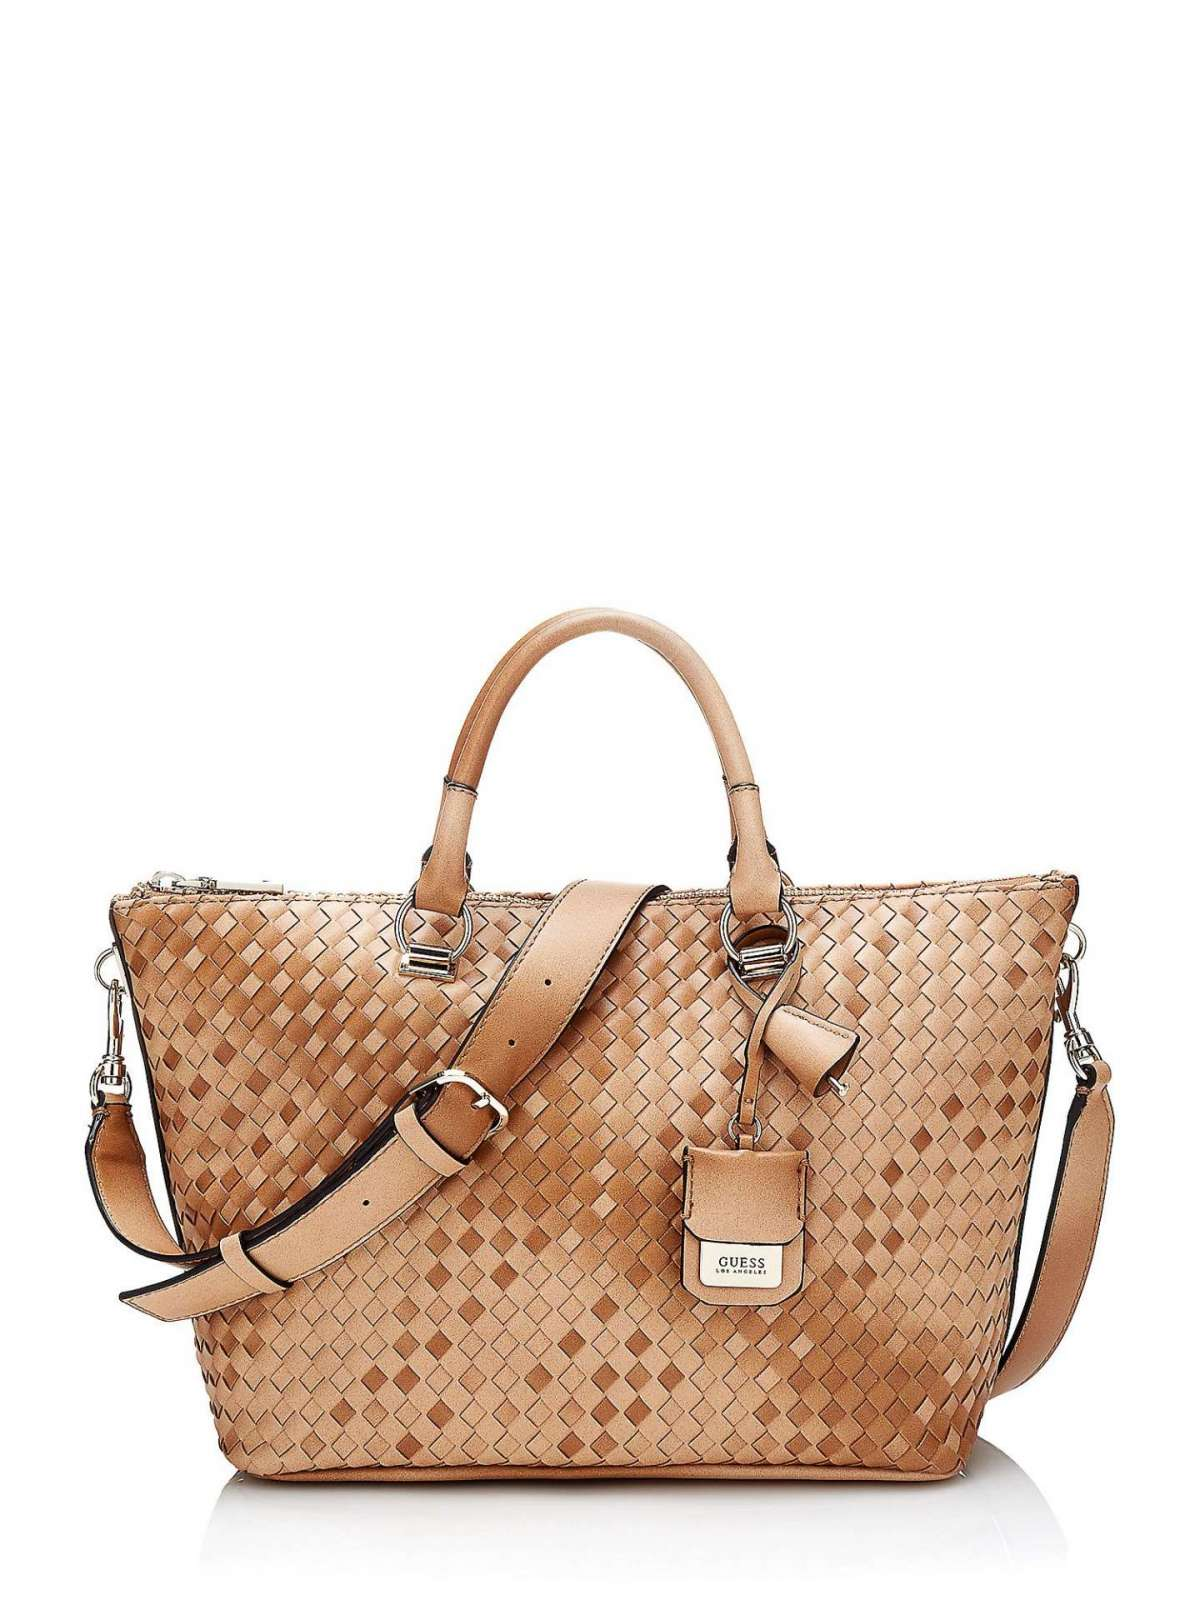 Handbag Intrecciata Cuoio Guess Autunno Inverno 2017